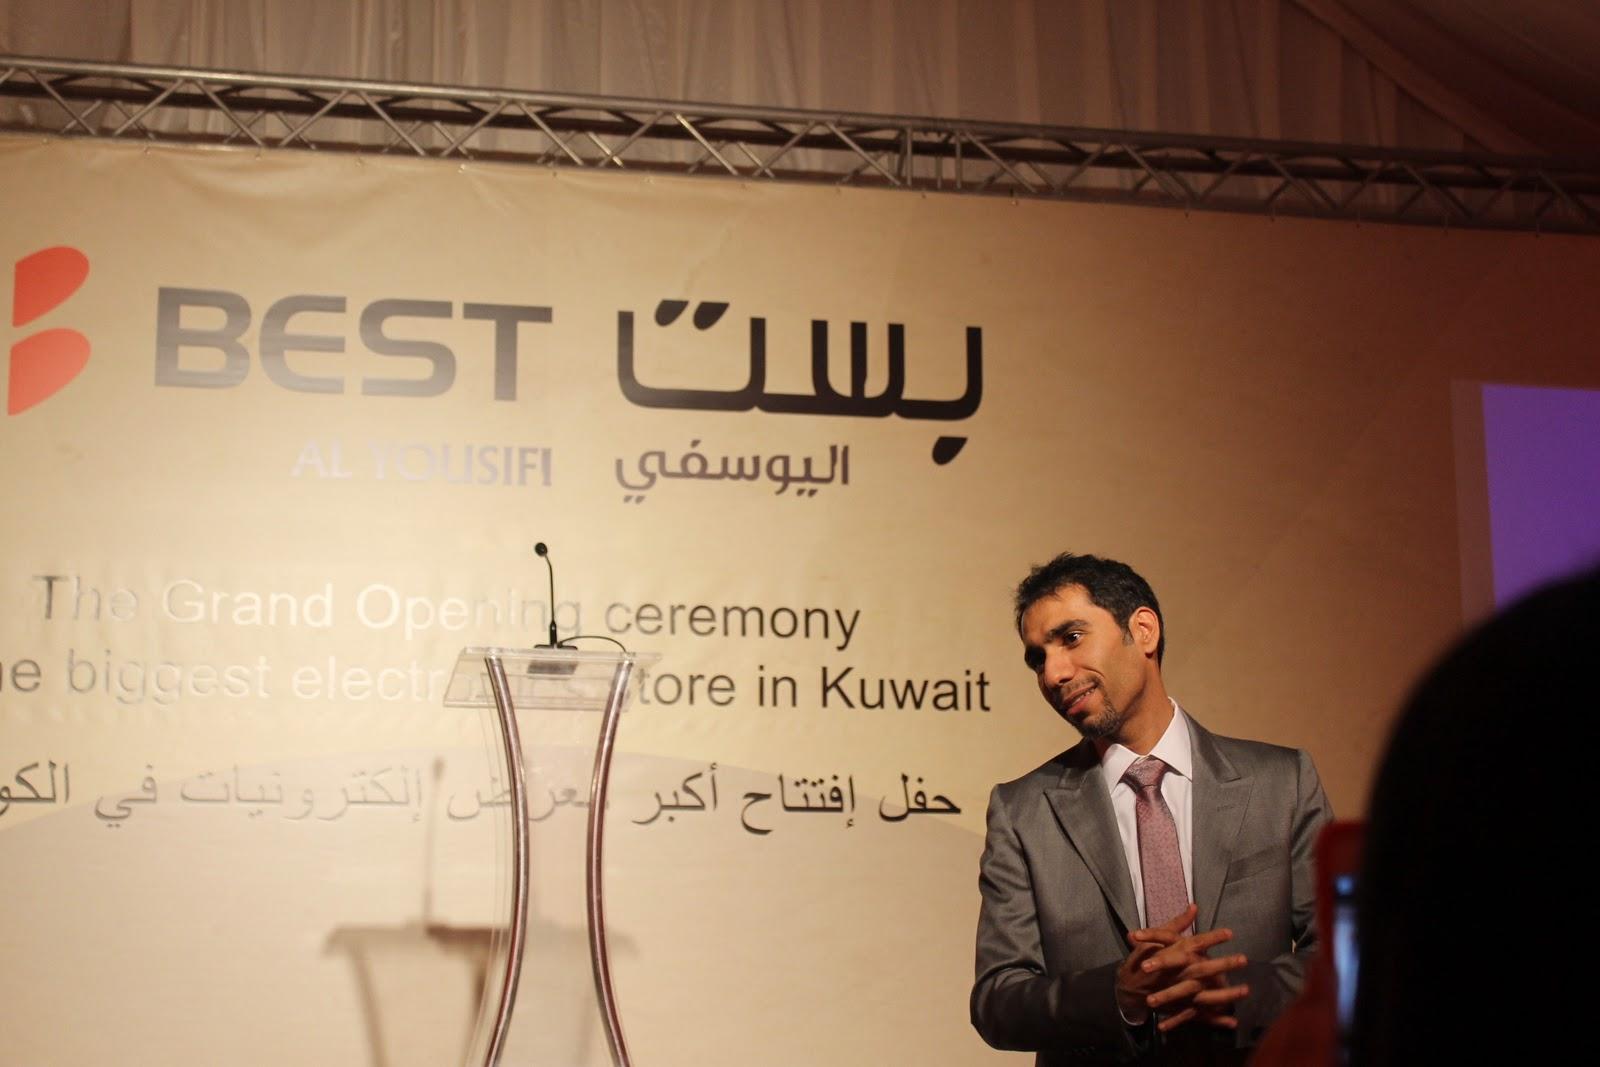 Alyousifi best kuwait dating